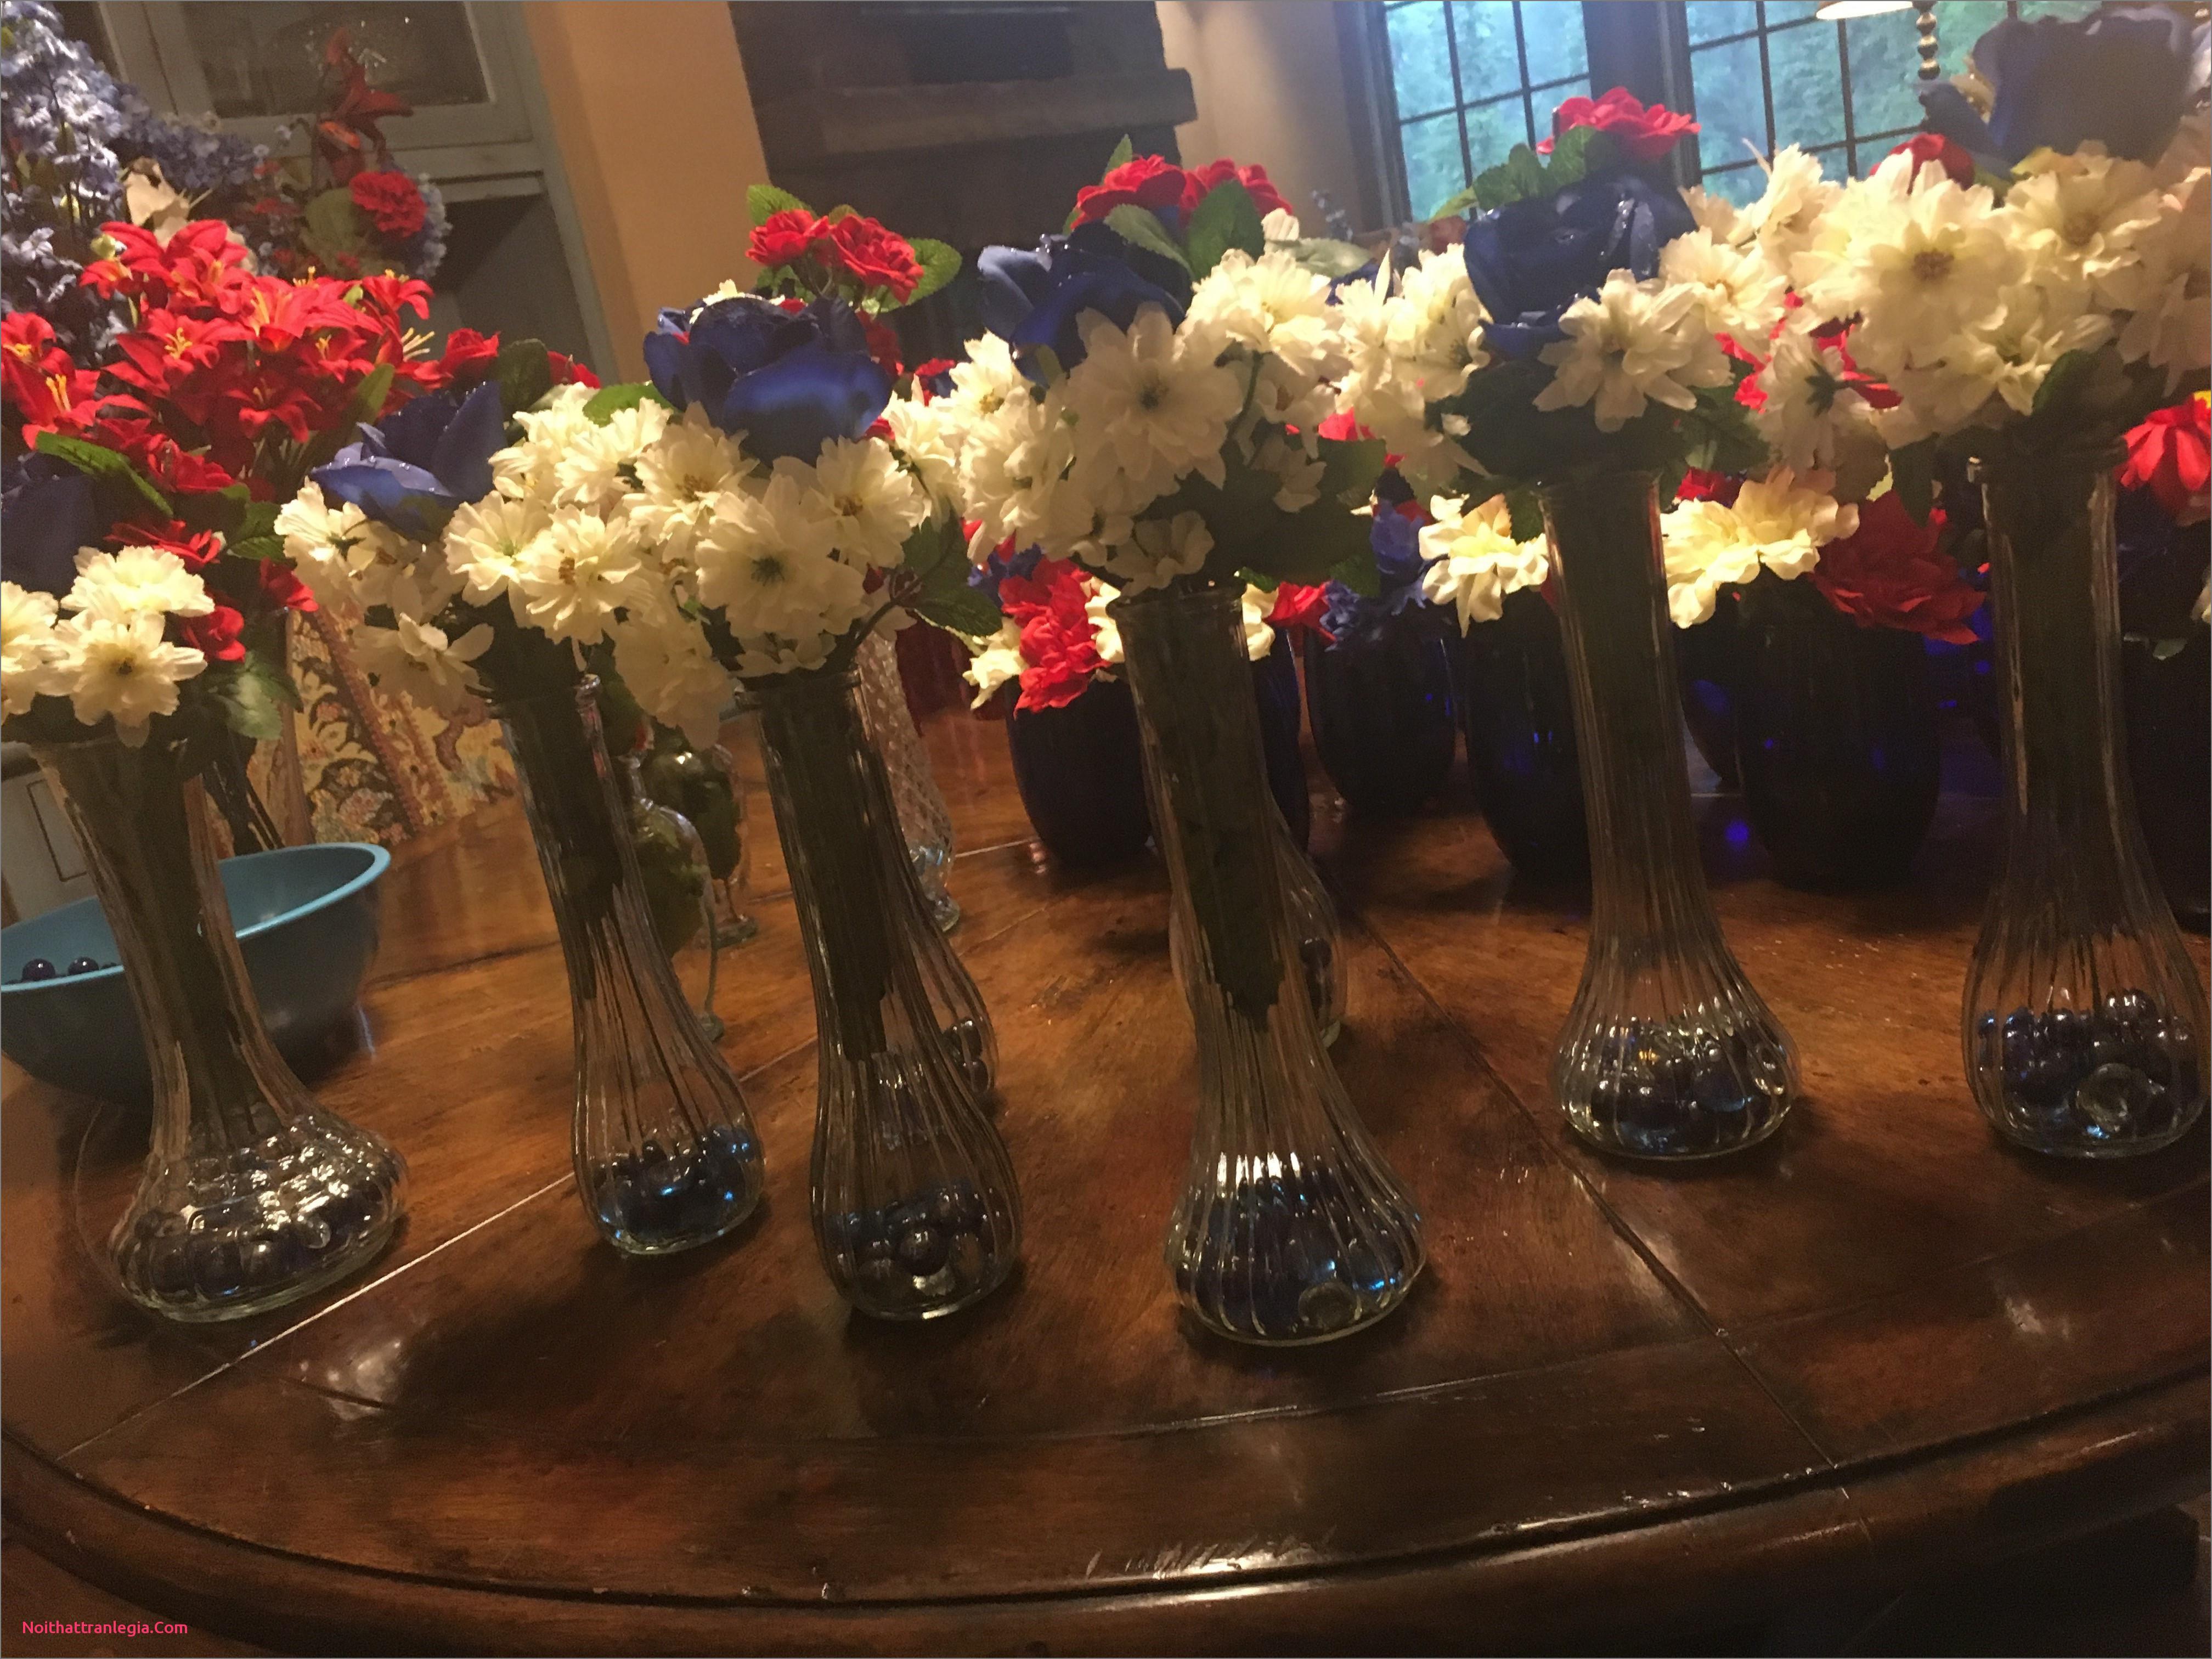 clear acrylic square vases of 20 wedding vases noithattranlegia vases design regarding decoration line luxury dollar tree wedding decorations awesome h vases dollar vase i 0d